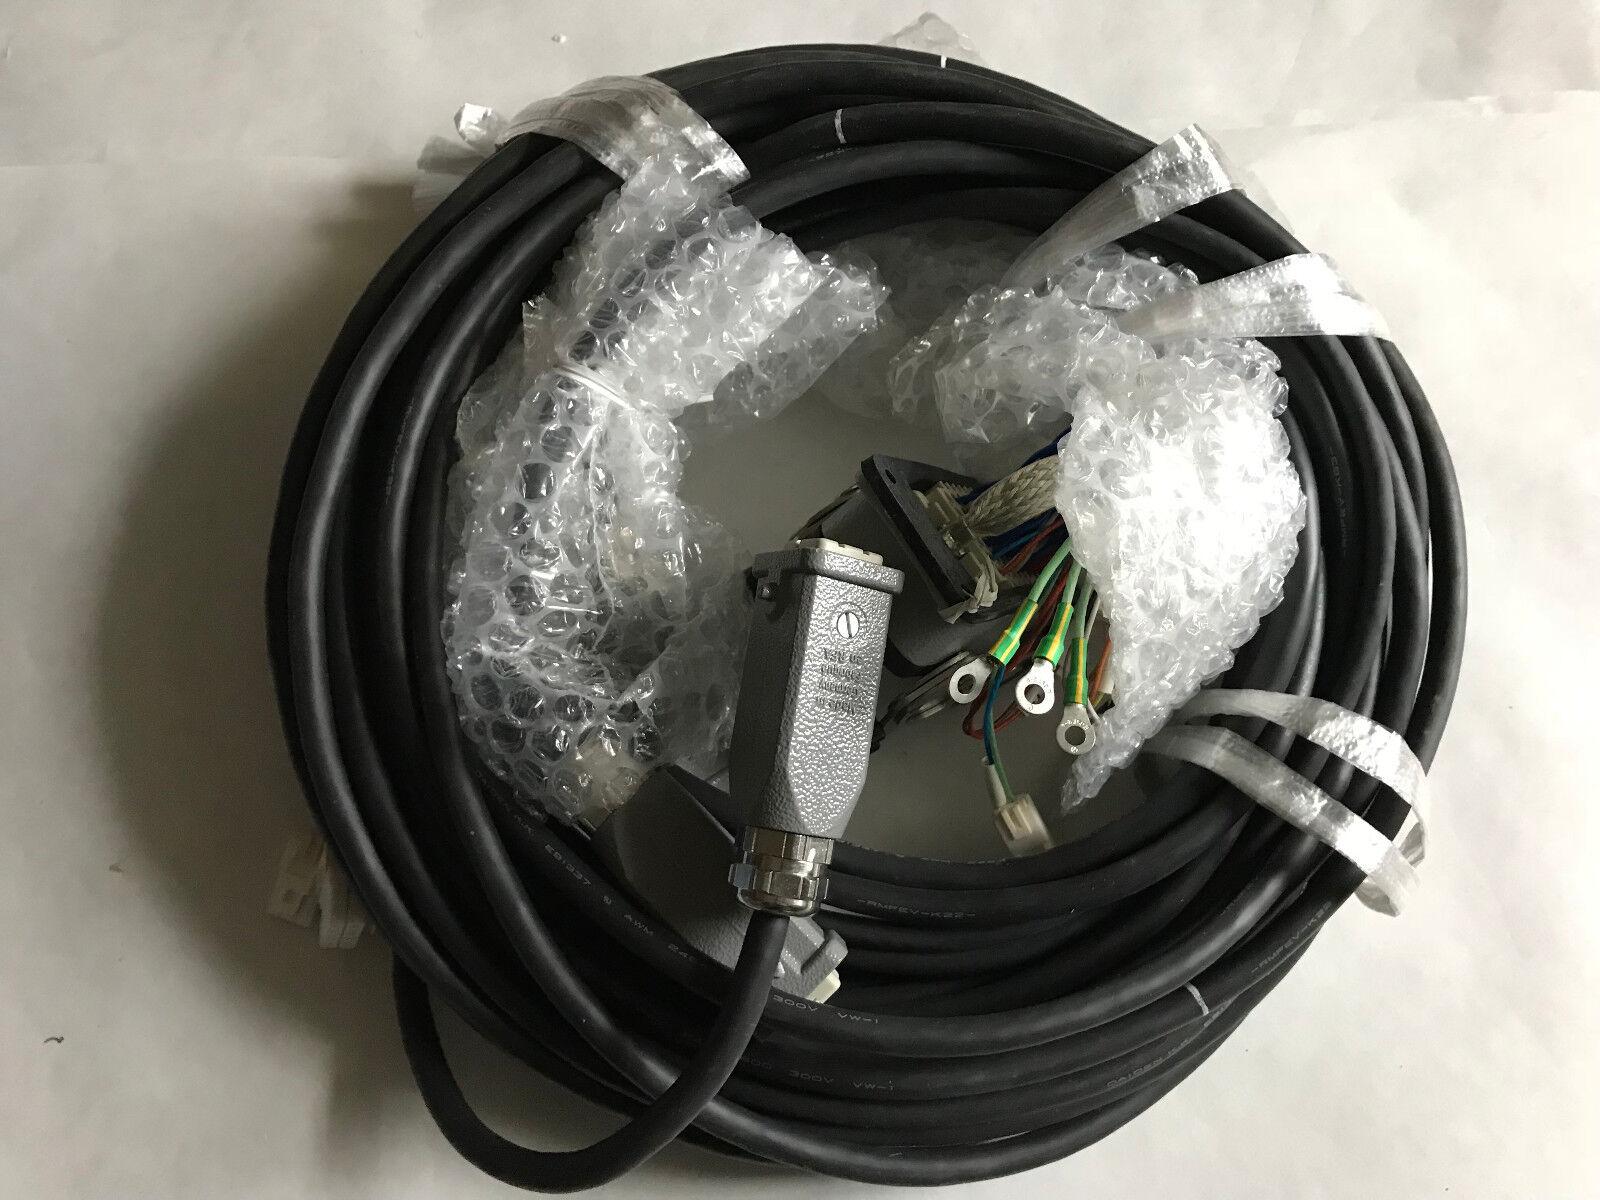 betts wiring harness kawasaki 50976 2428 rev g servo motor wire harness cable xjt5m best wiring harness for 1967 camaro kawasaki 50976 2428 rev g servo motor